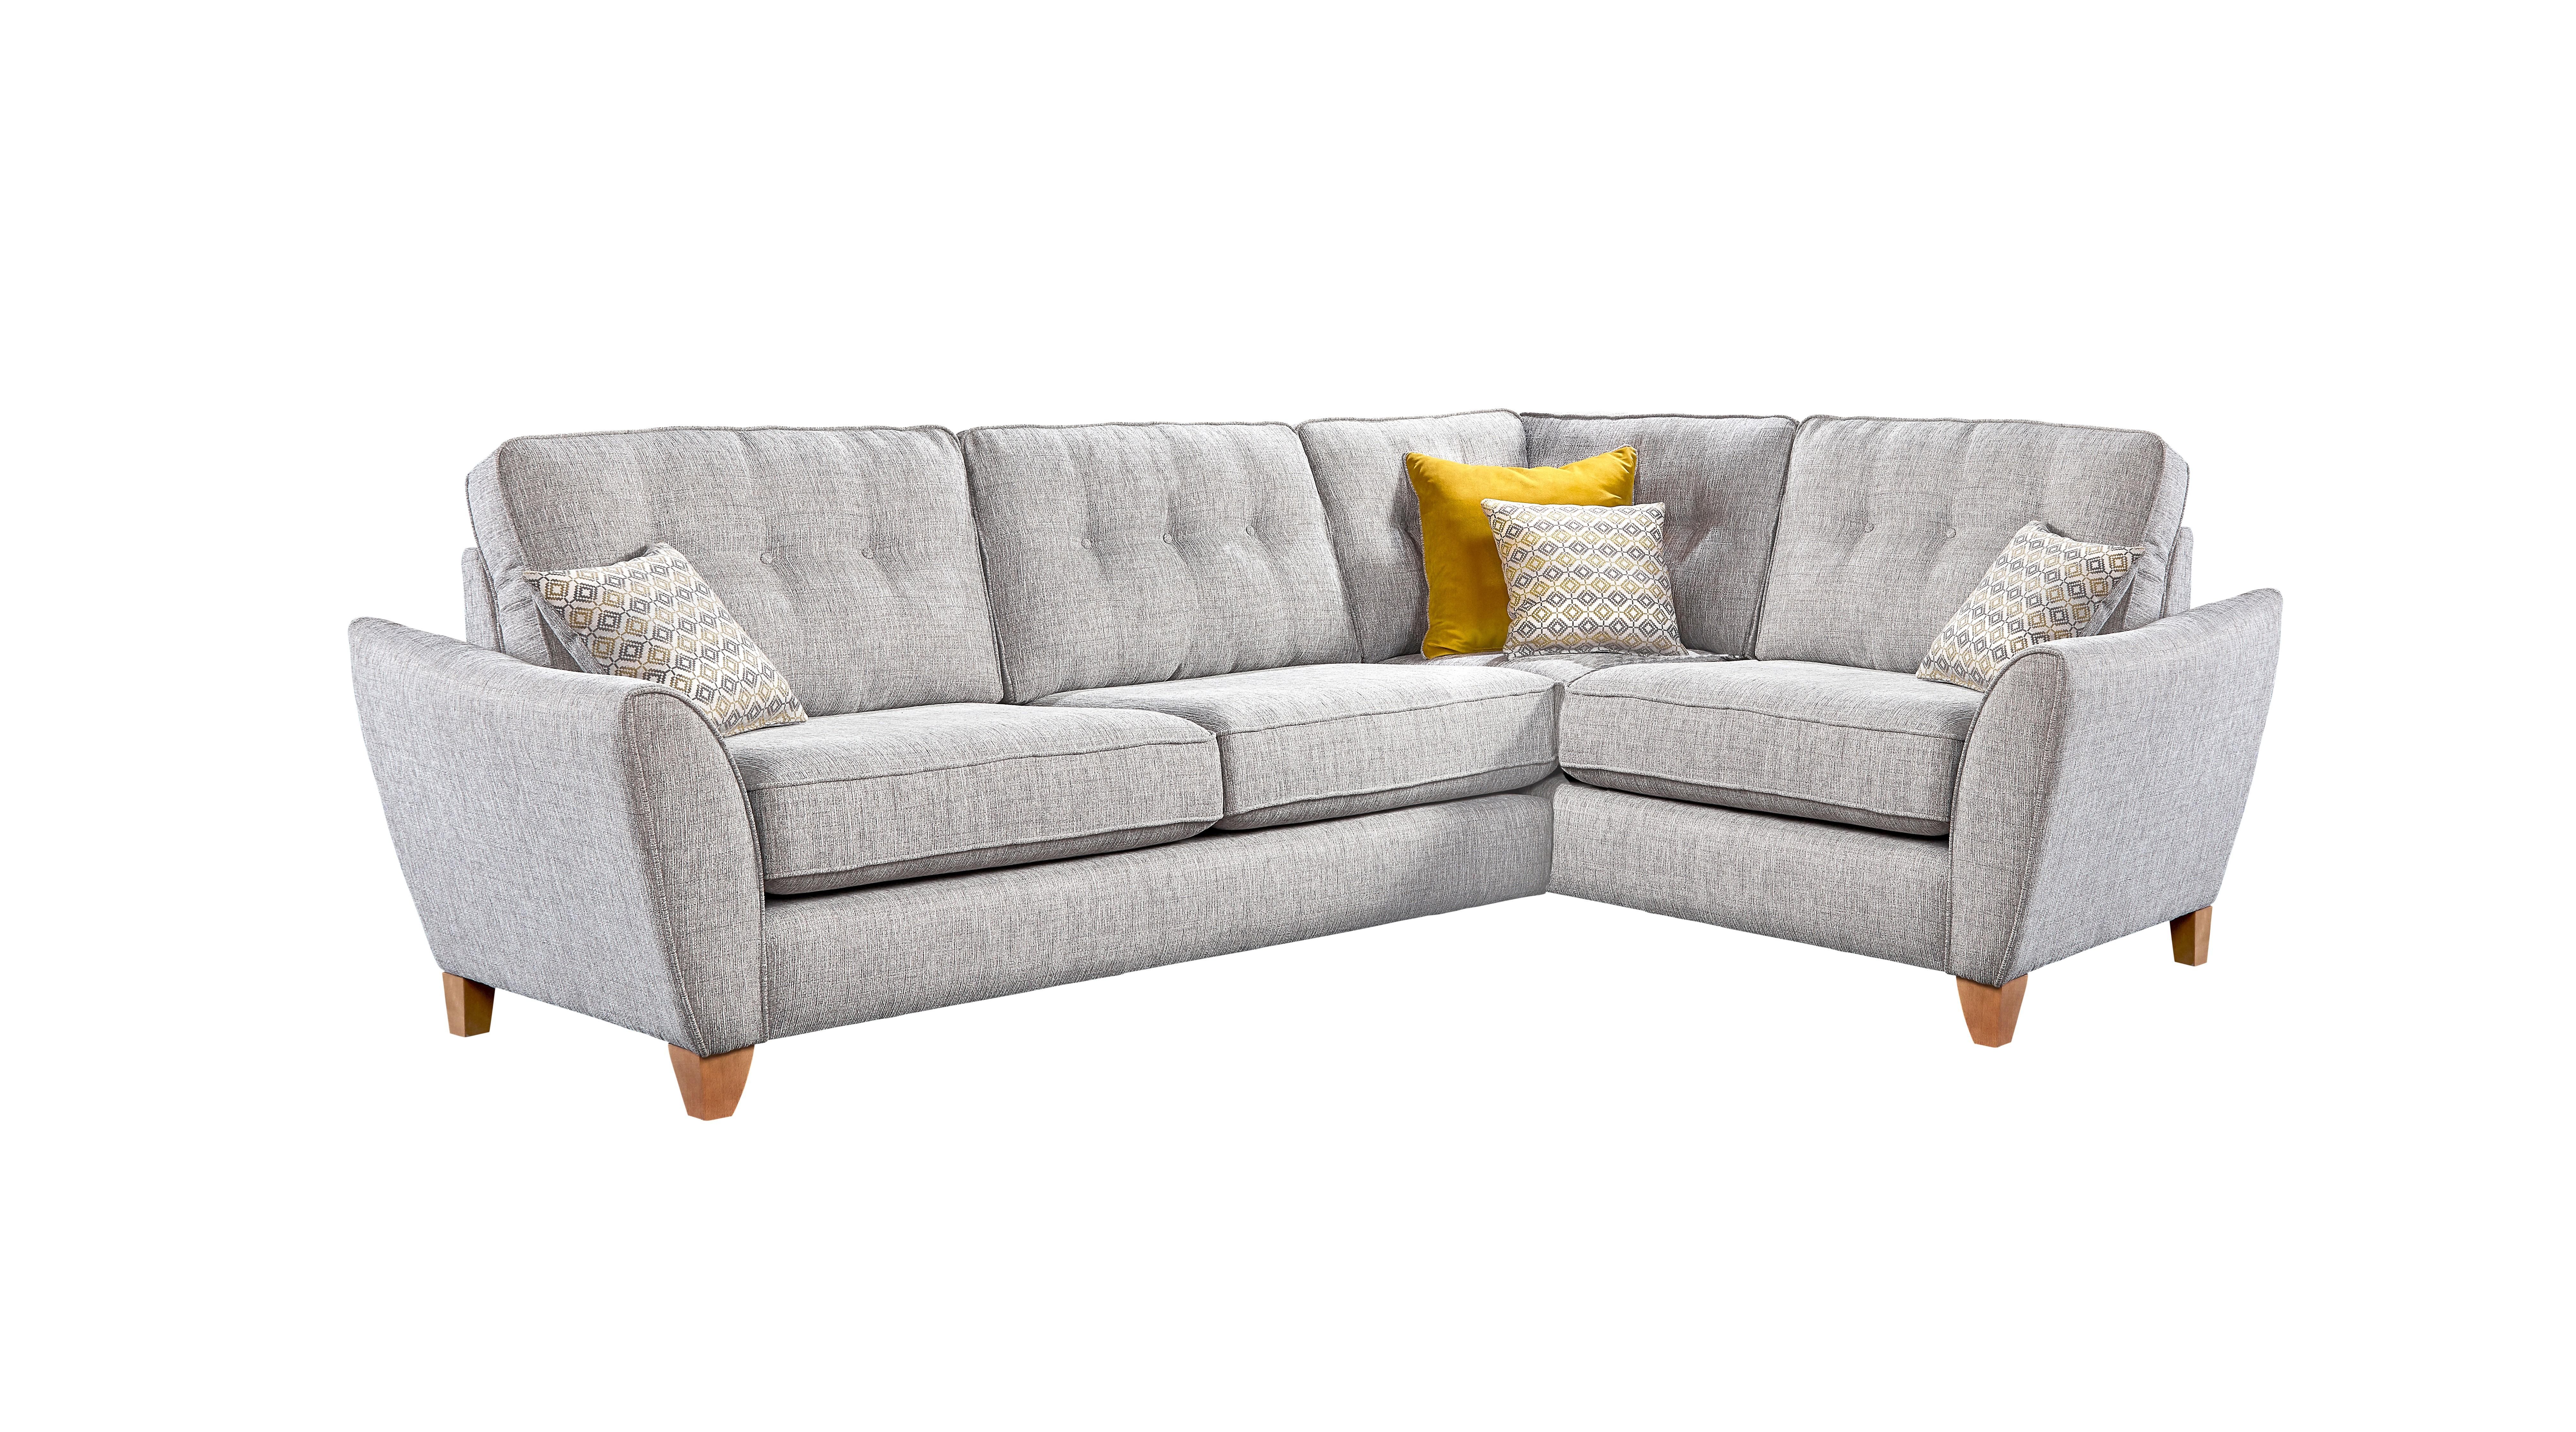 Small Corner Sofa felicity small corner sofa - 2 seater lhf arm UCYORRB